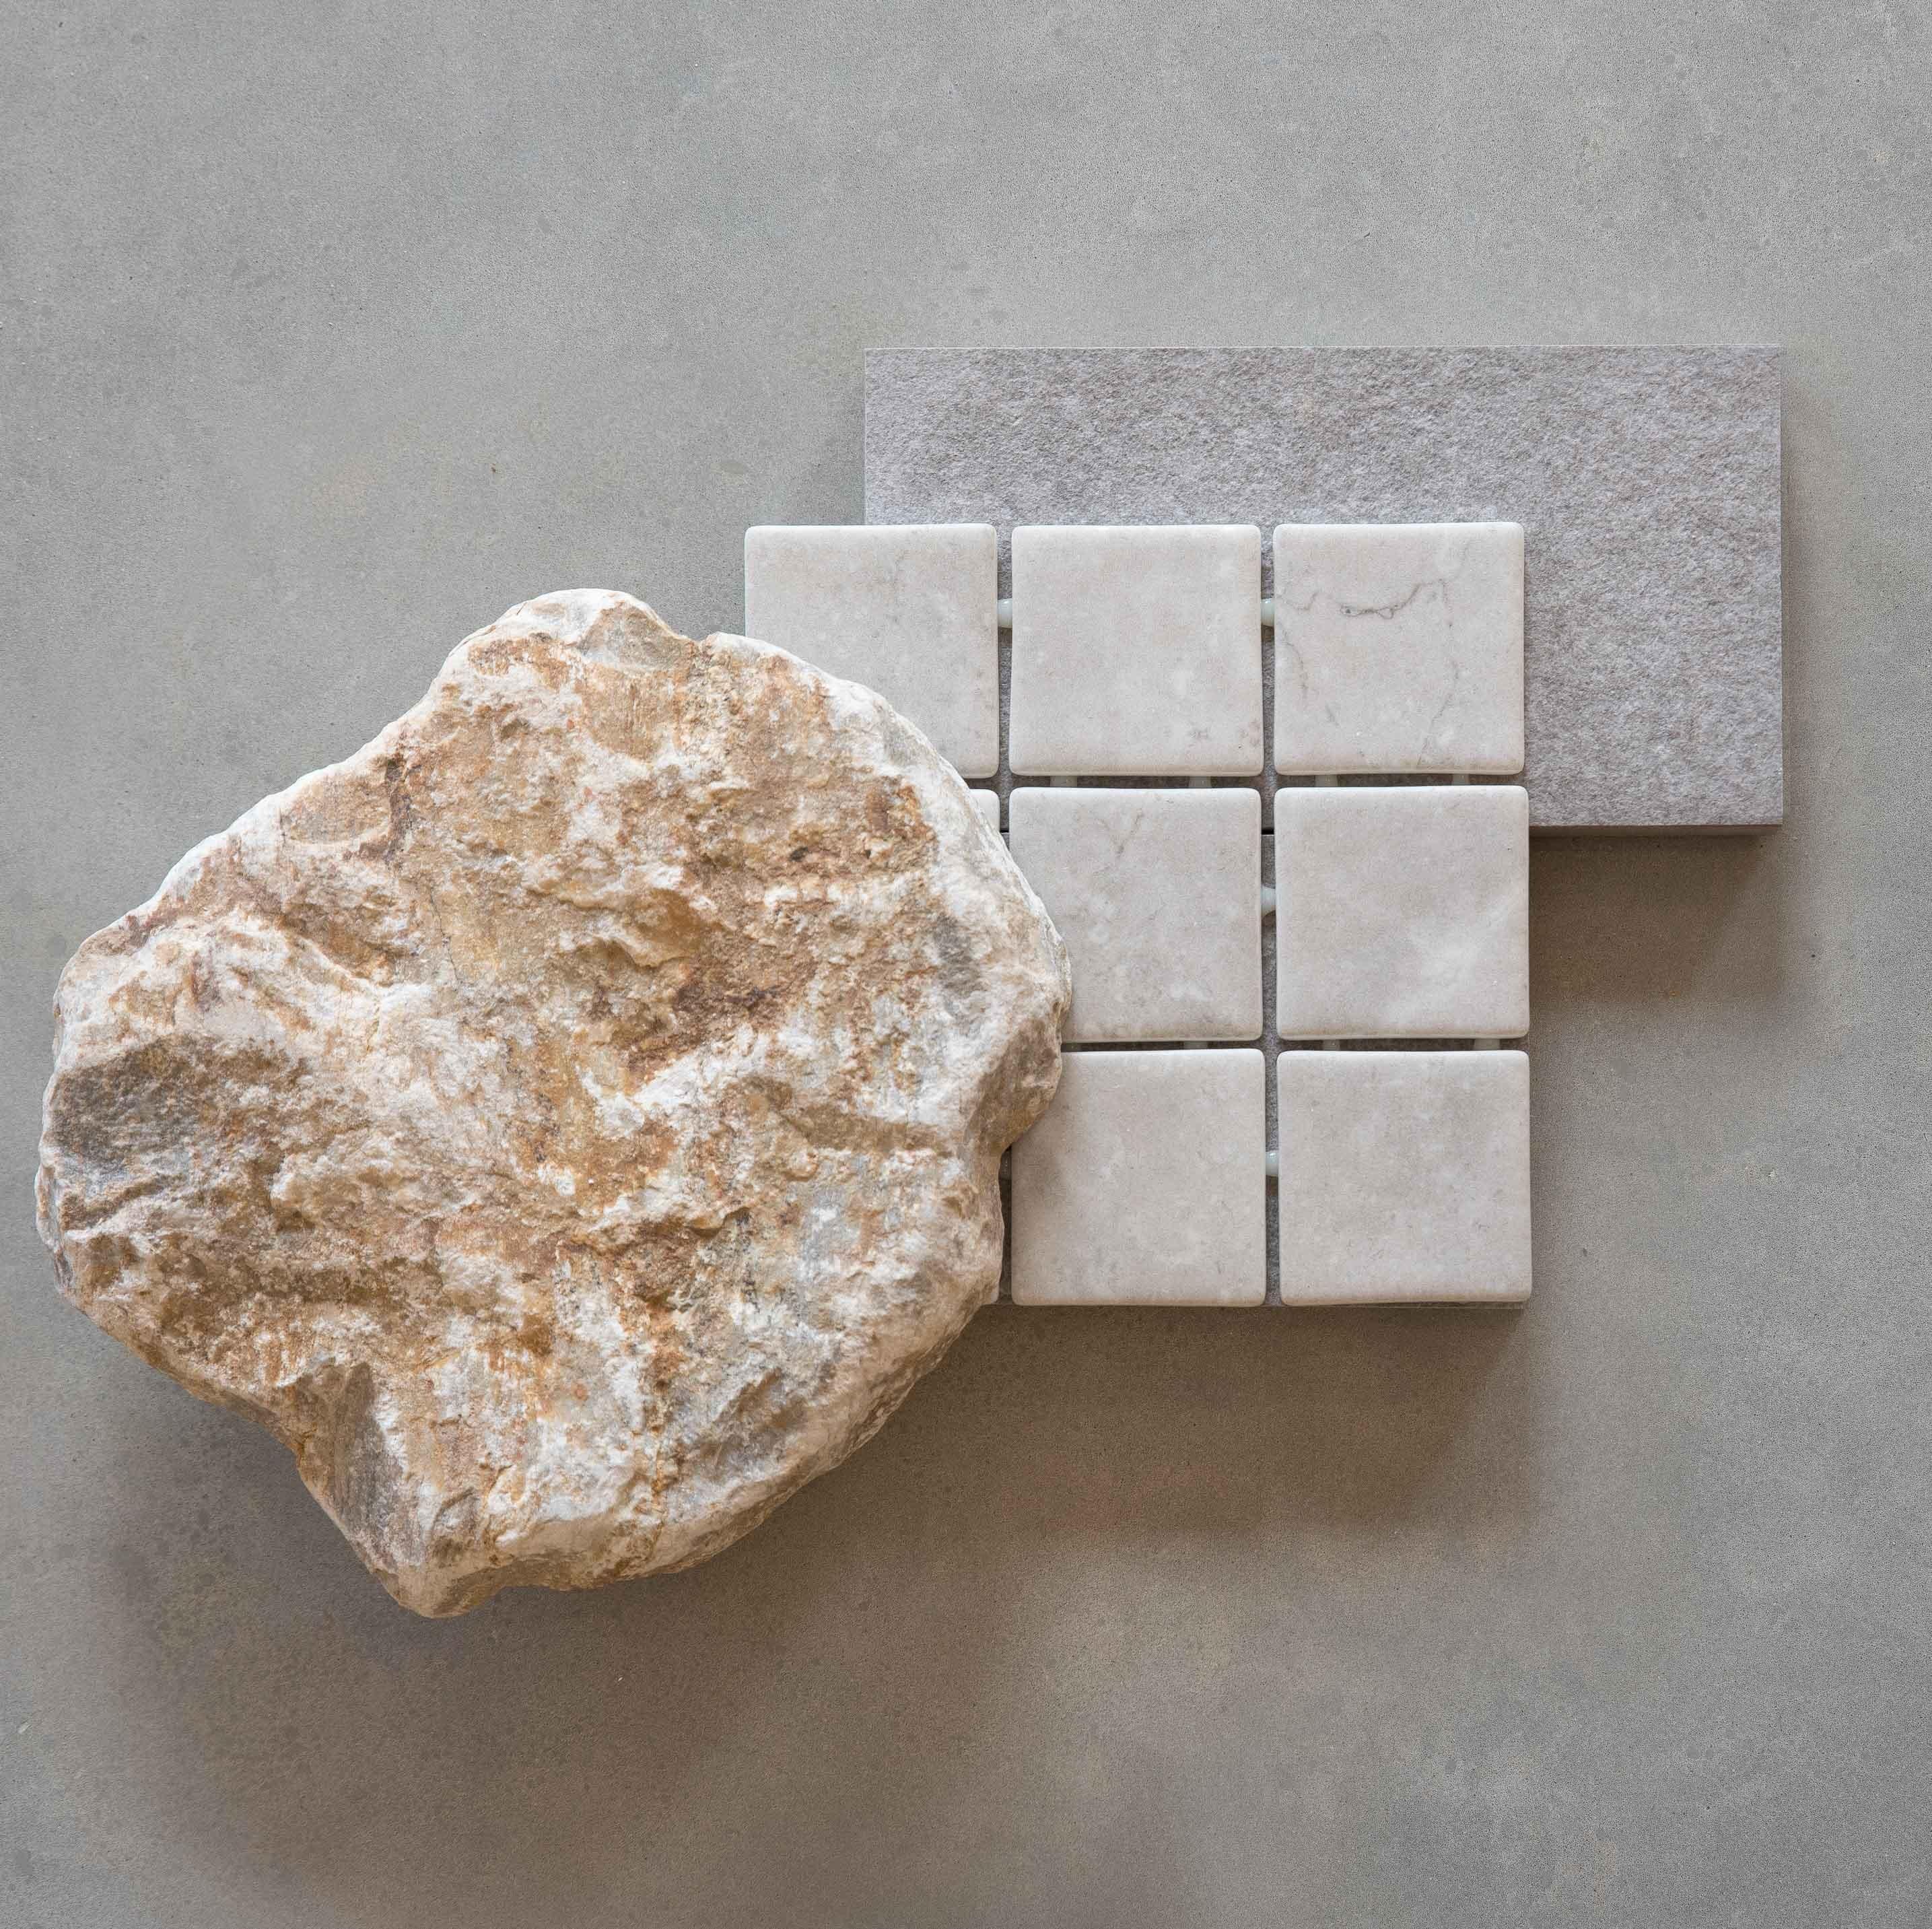 Pool-Tiles Hero Onix Fragment